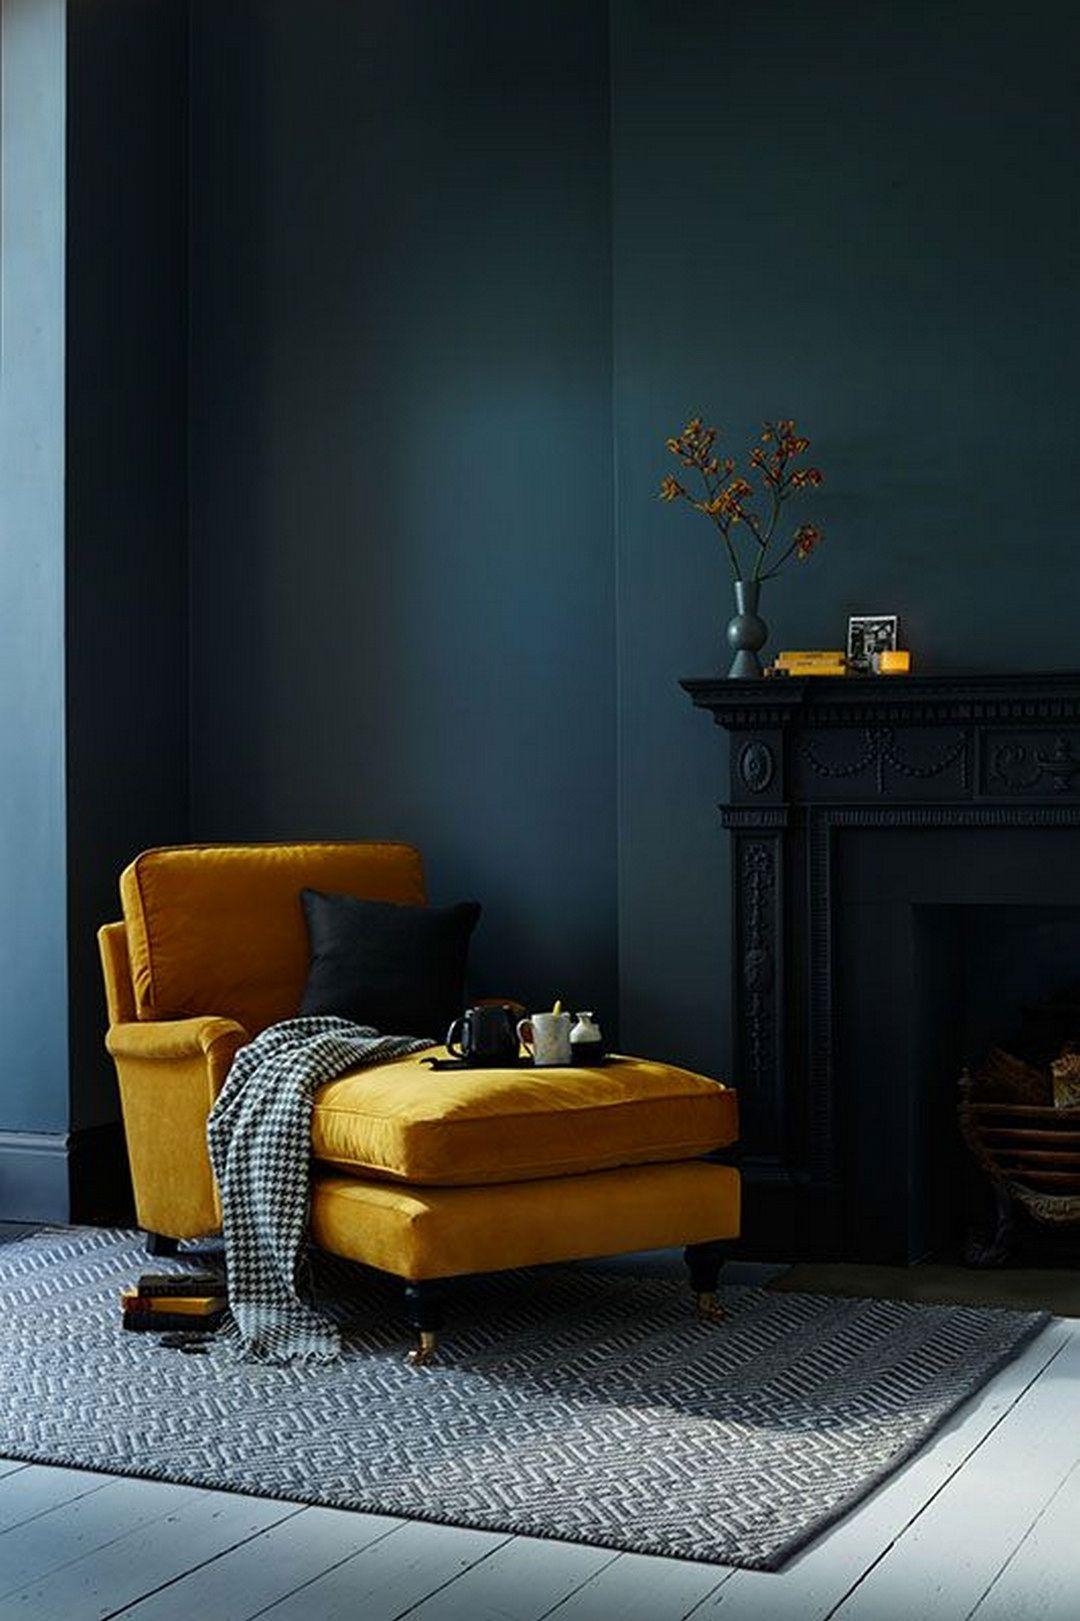 méridienne velours jaune moutarde salon vintage bleu marine canard - blog déco - clem around the corner